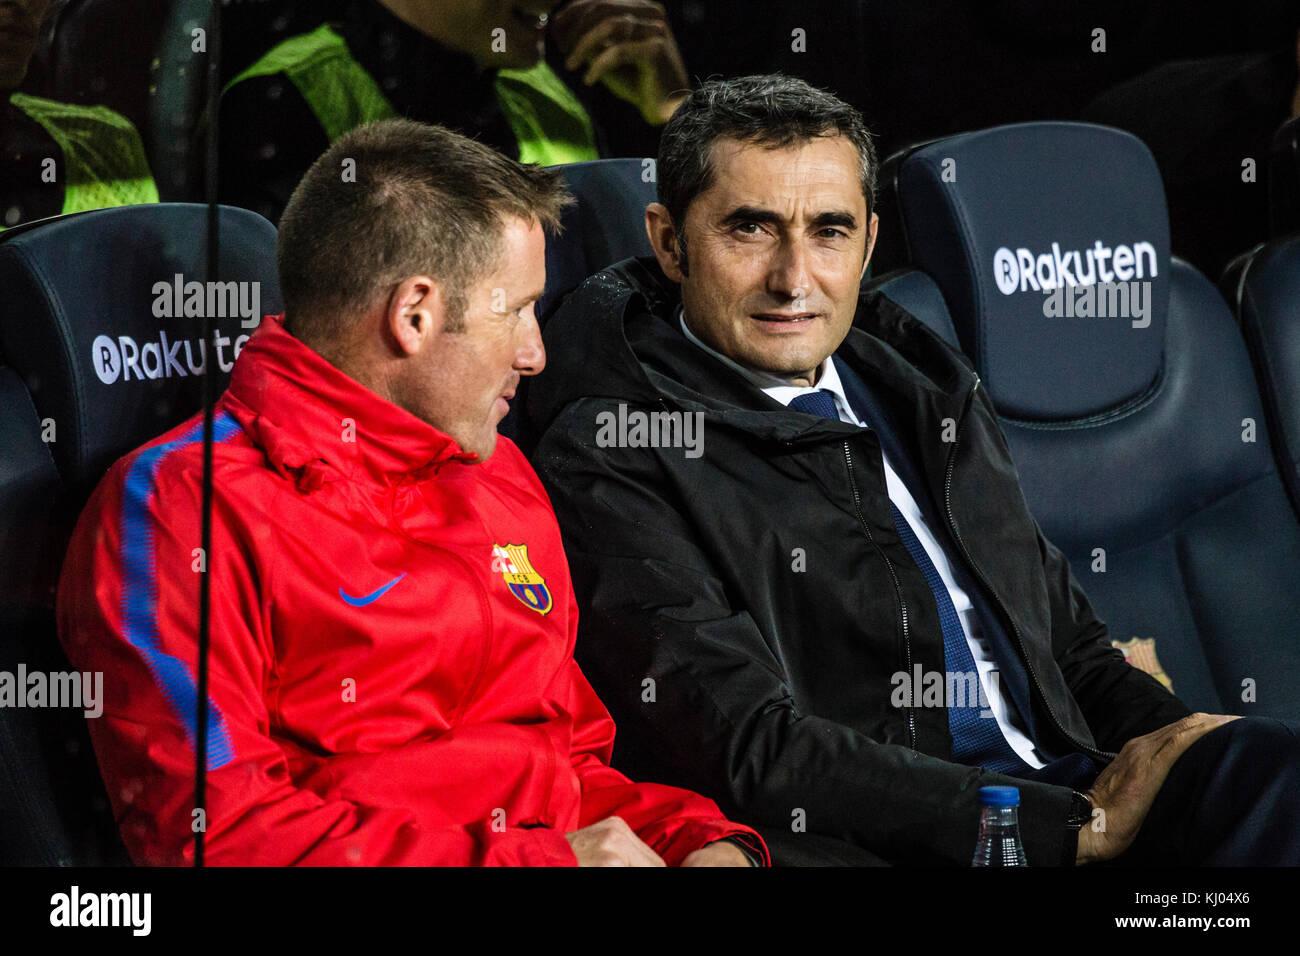 November 4, 2017 - Camp Nou, Barcelona, Spain - Ernesto Valverde, coach of FC Barcelona team before the match of - Stock Image